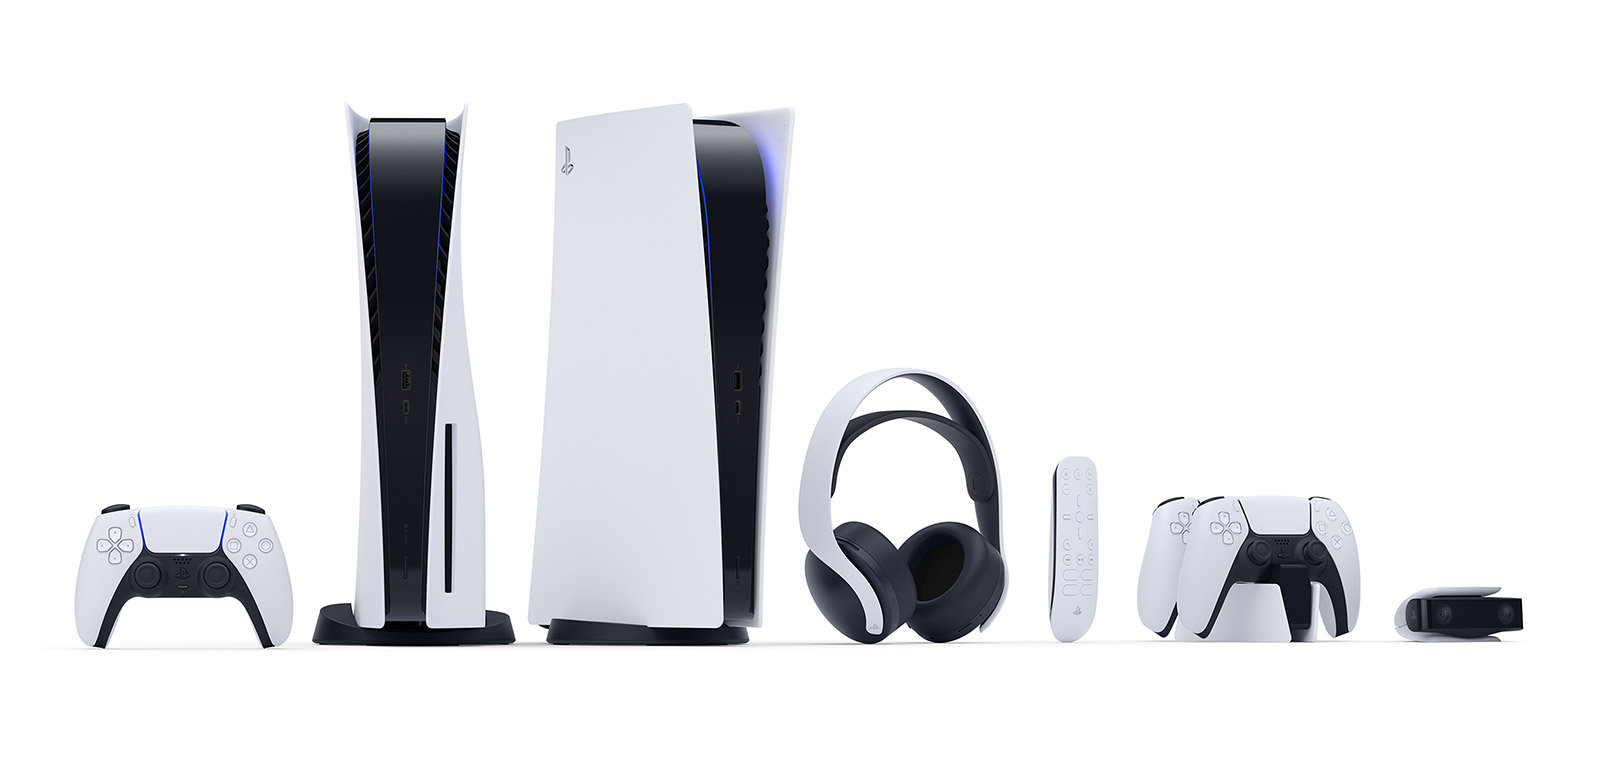 ps5 group hardware image block 01 en 11jun20 - Playstation 5 Hardware Reveal Presentation